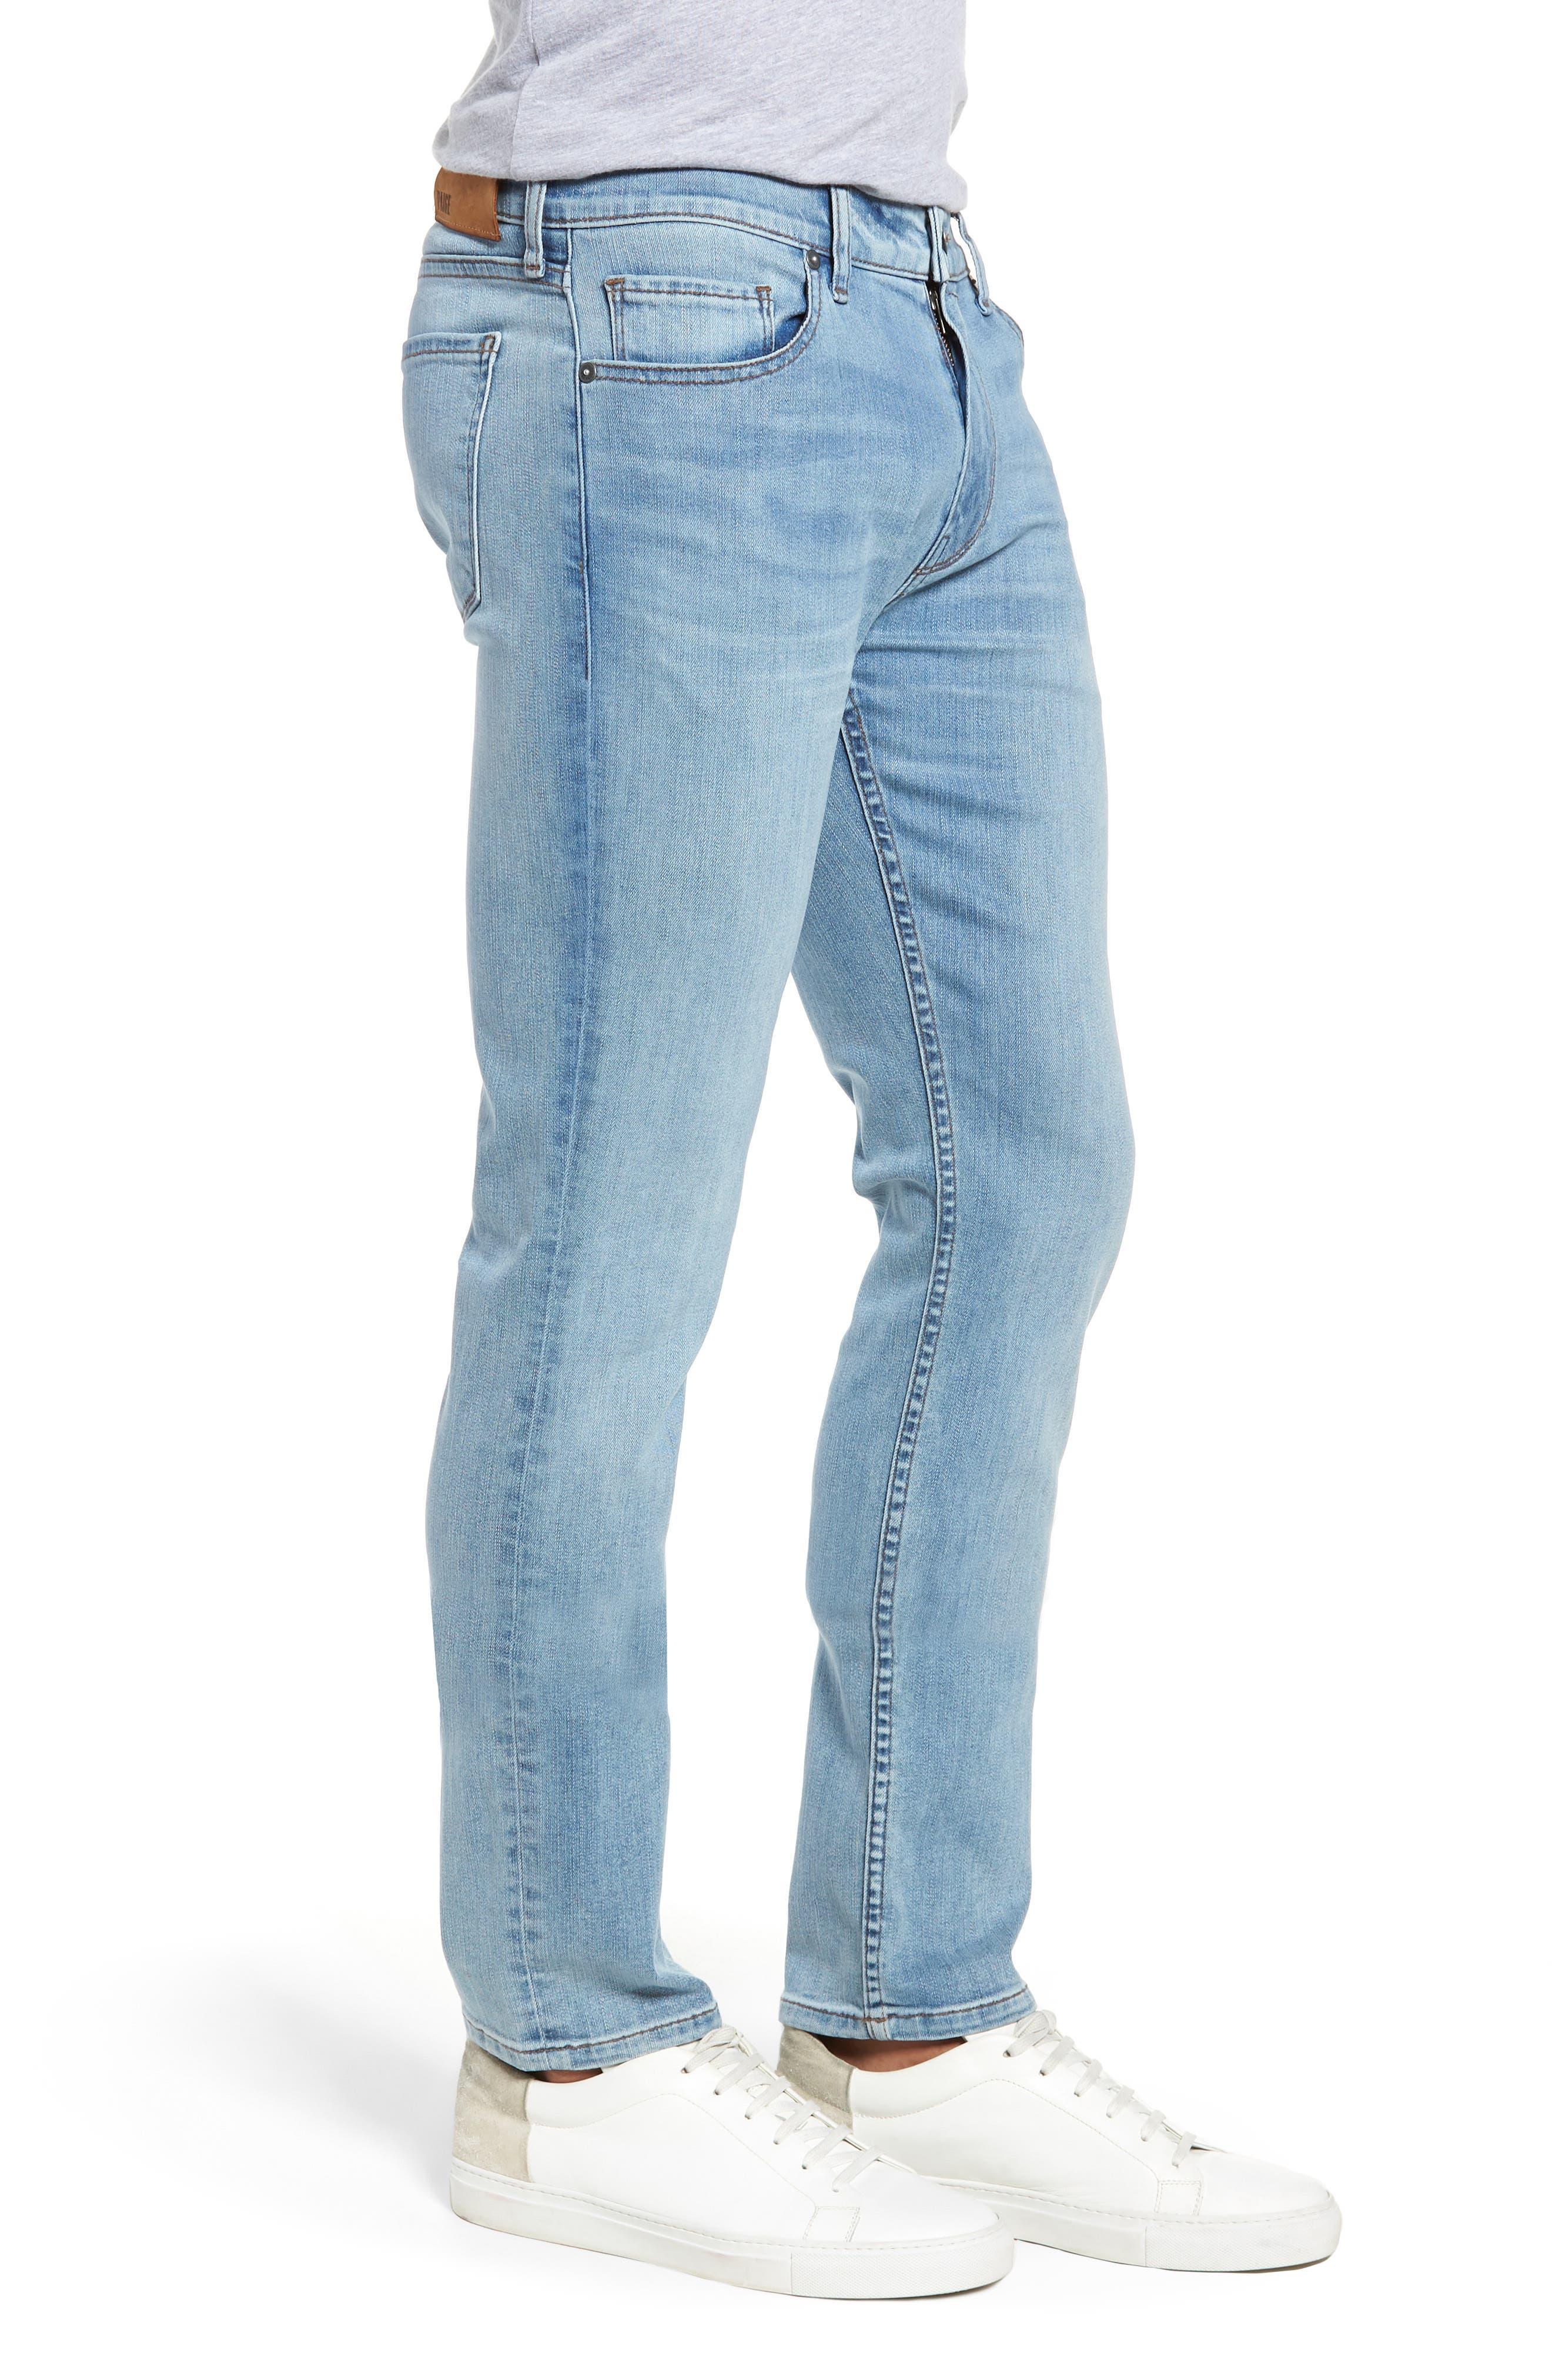 Transcend Vintage - Lennox Slim Fit Jeans,                             Alternate thumbnail 3, color,                             DENVER